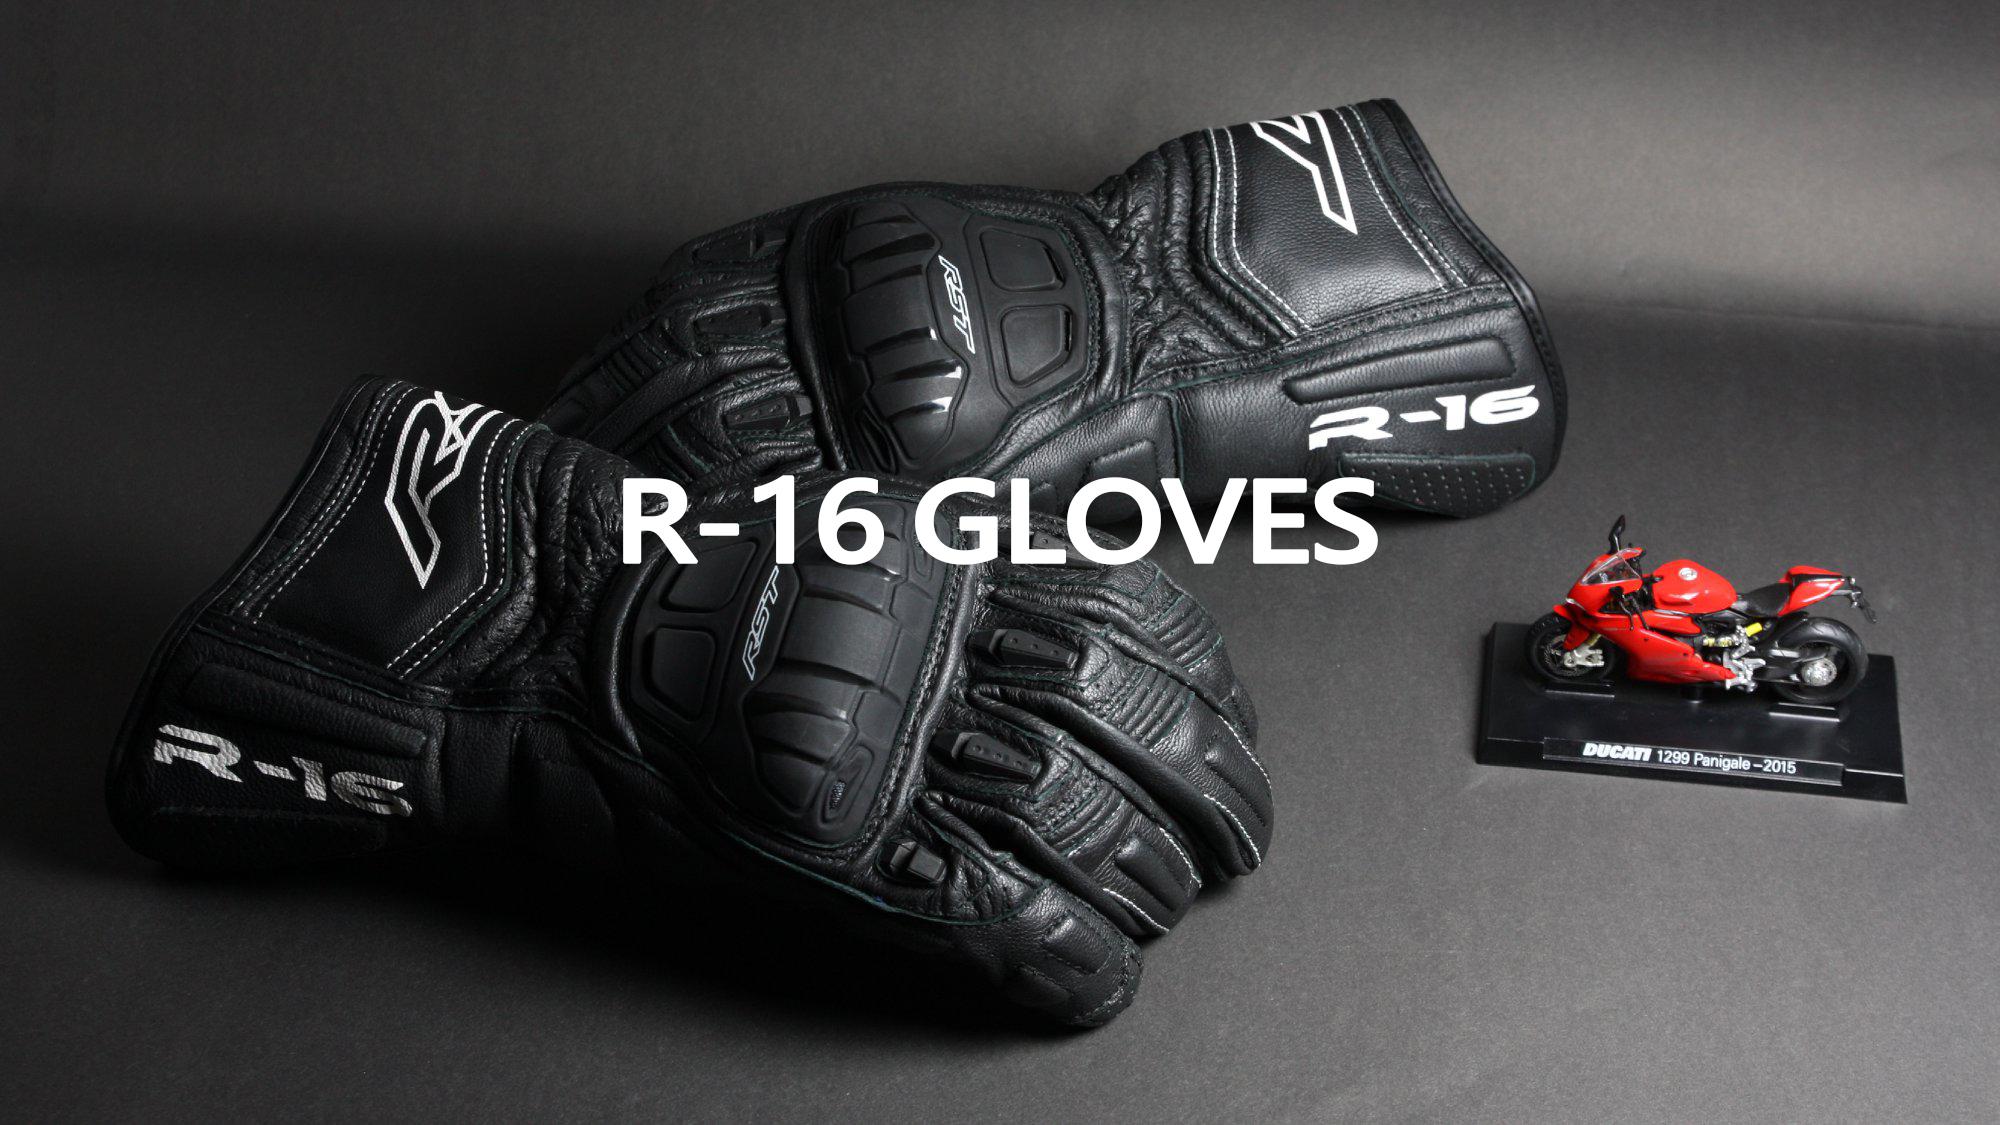 1062 R-16 - RST GLOVES 大降價!